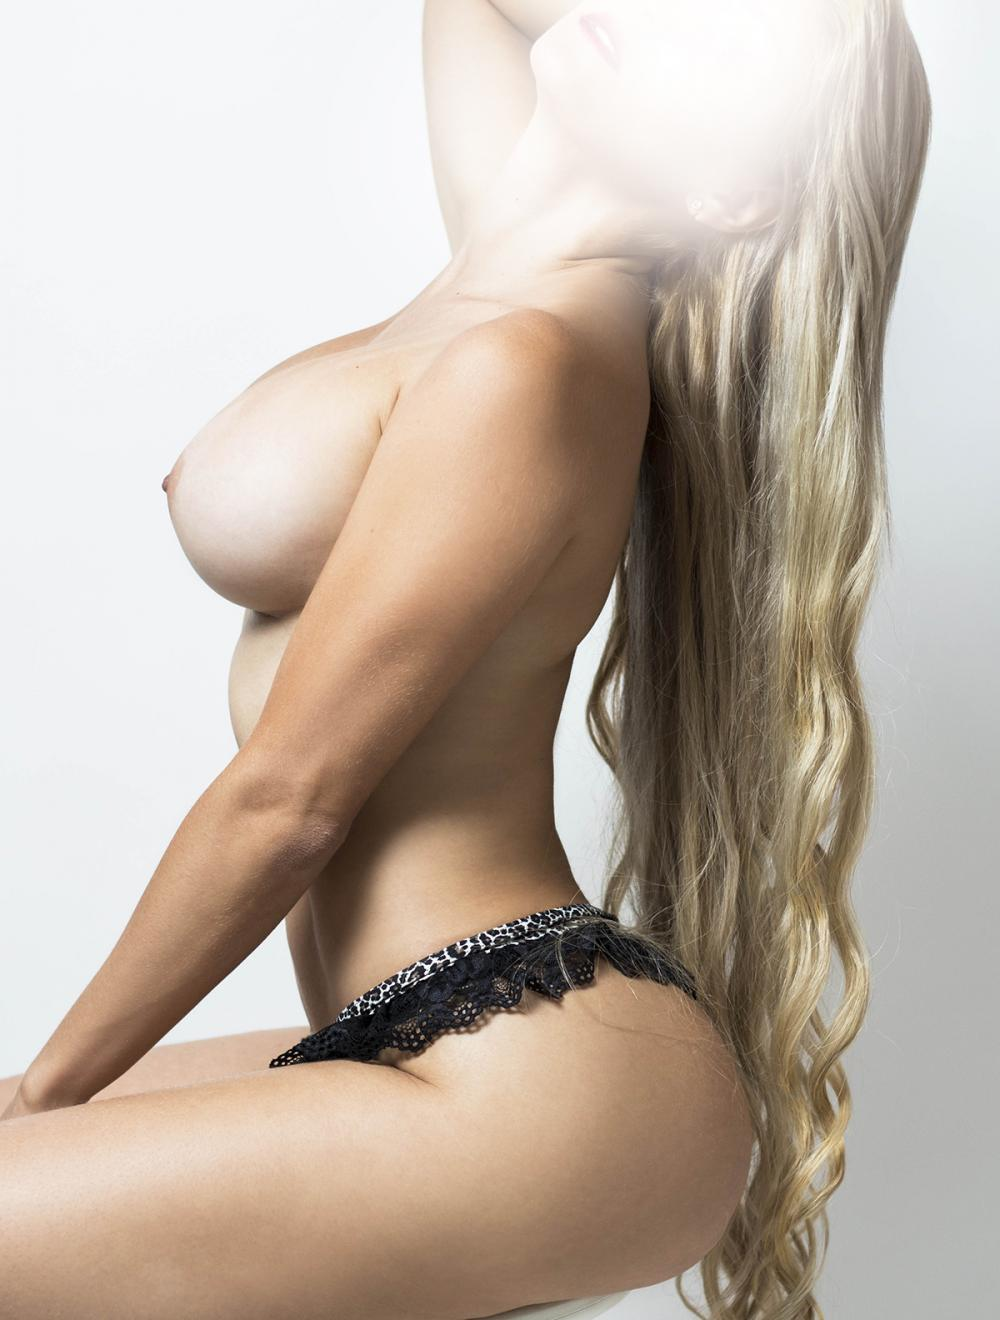 escort fantasias videos xxn